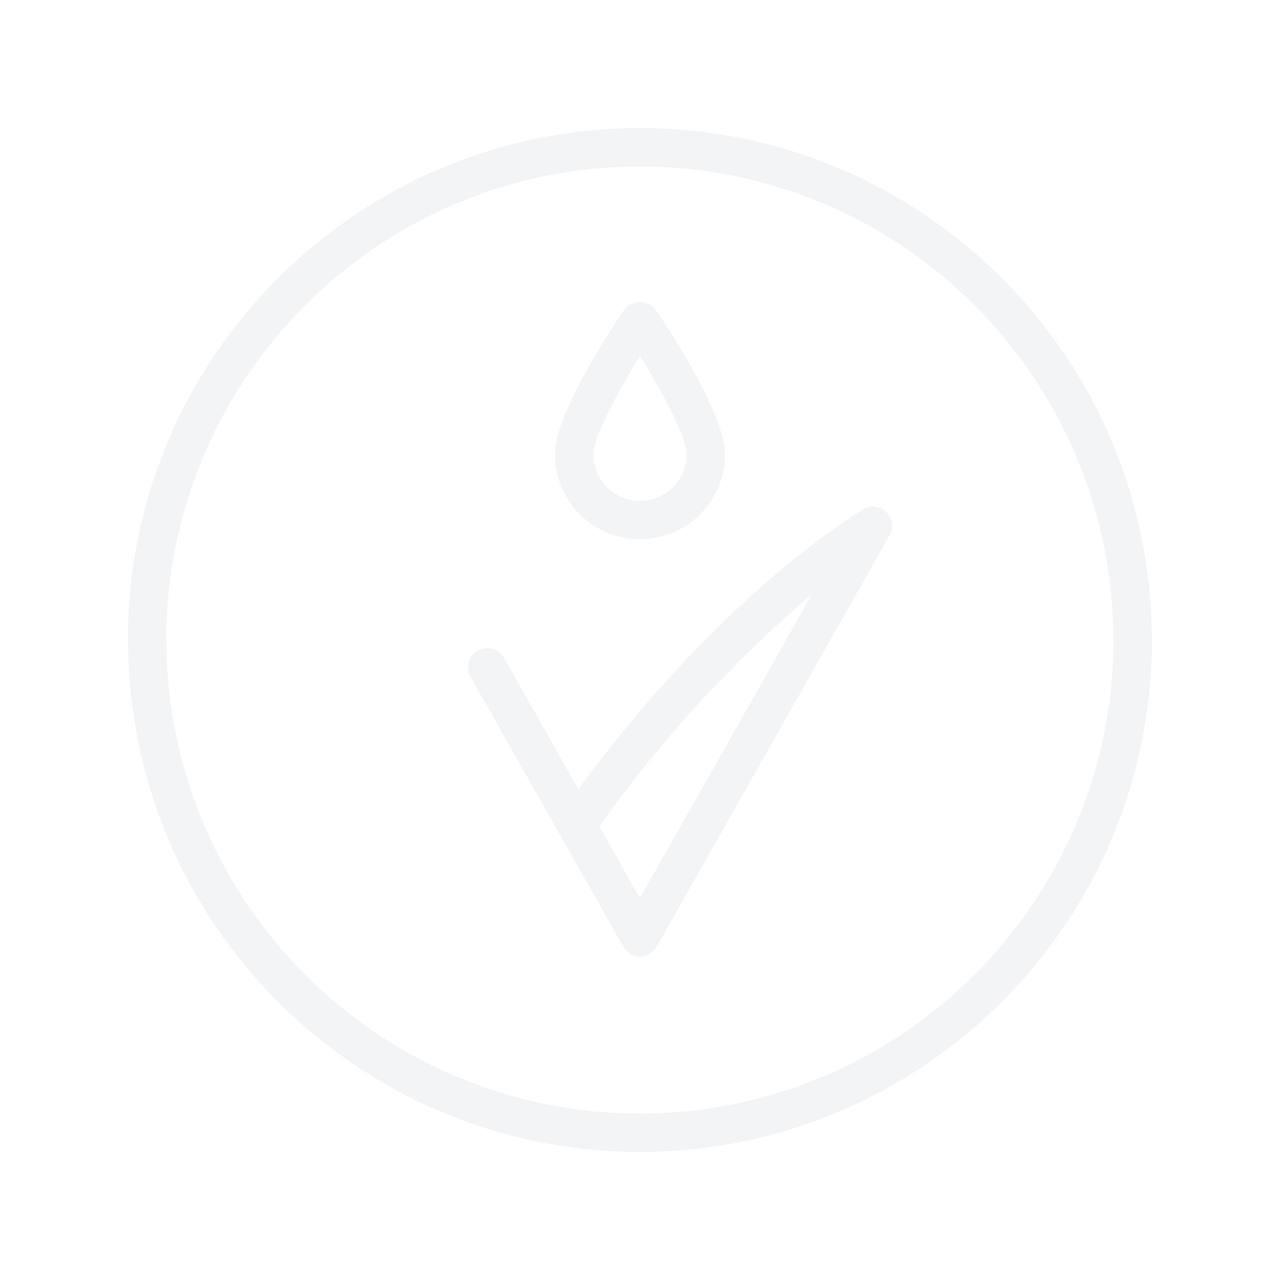 KNEIPP Calendula-Rosemary Foot Bath Crystals 500g